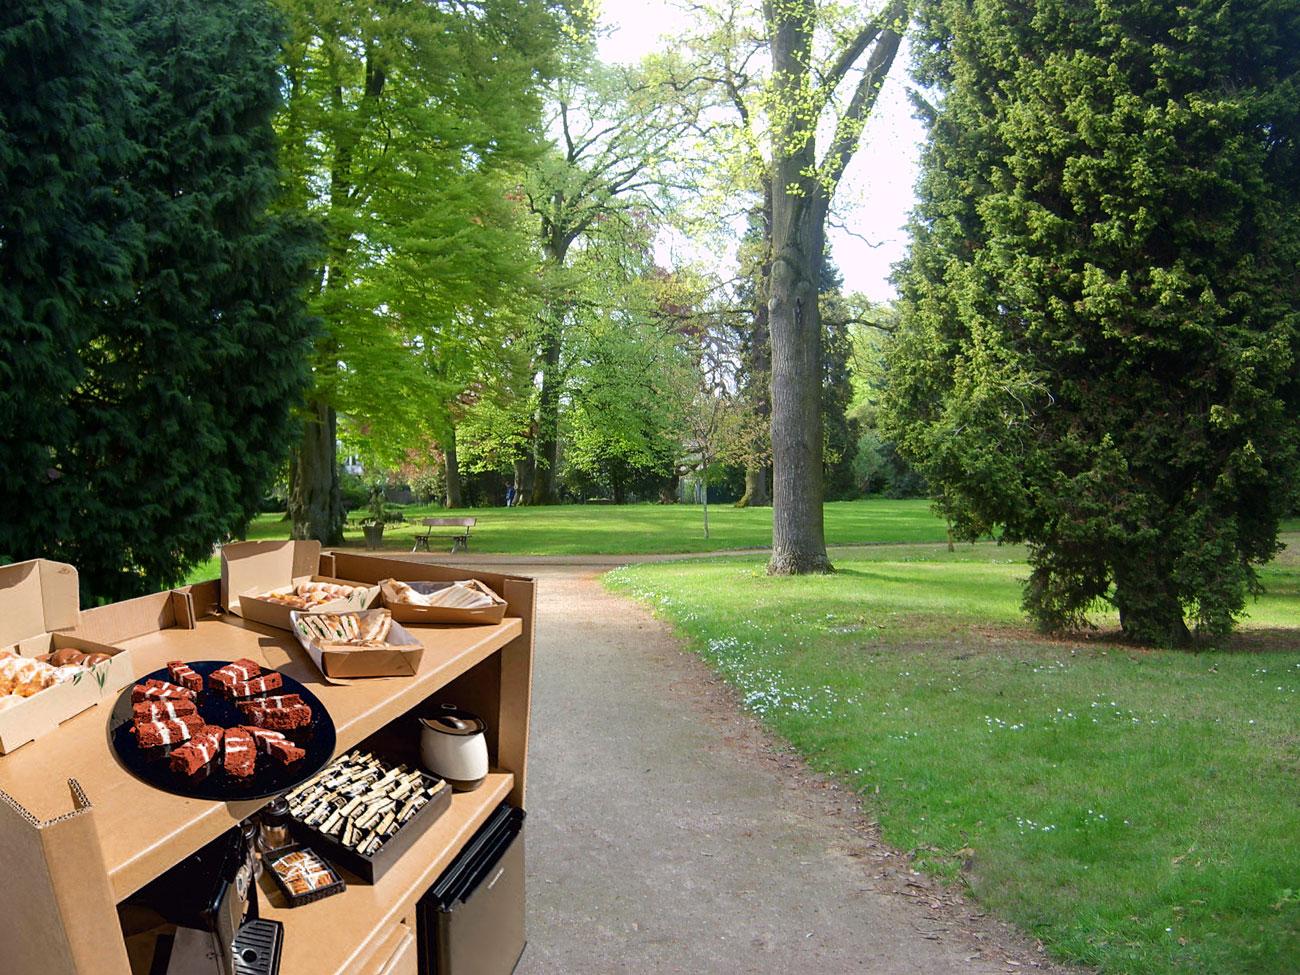 servicios funerarios de catering para velatorios